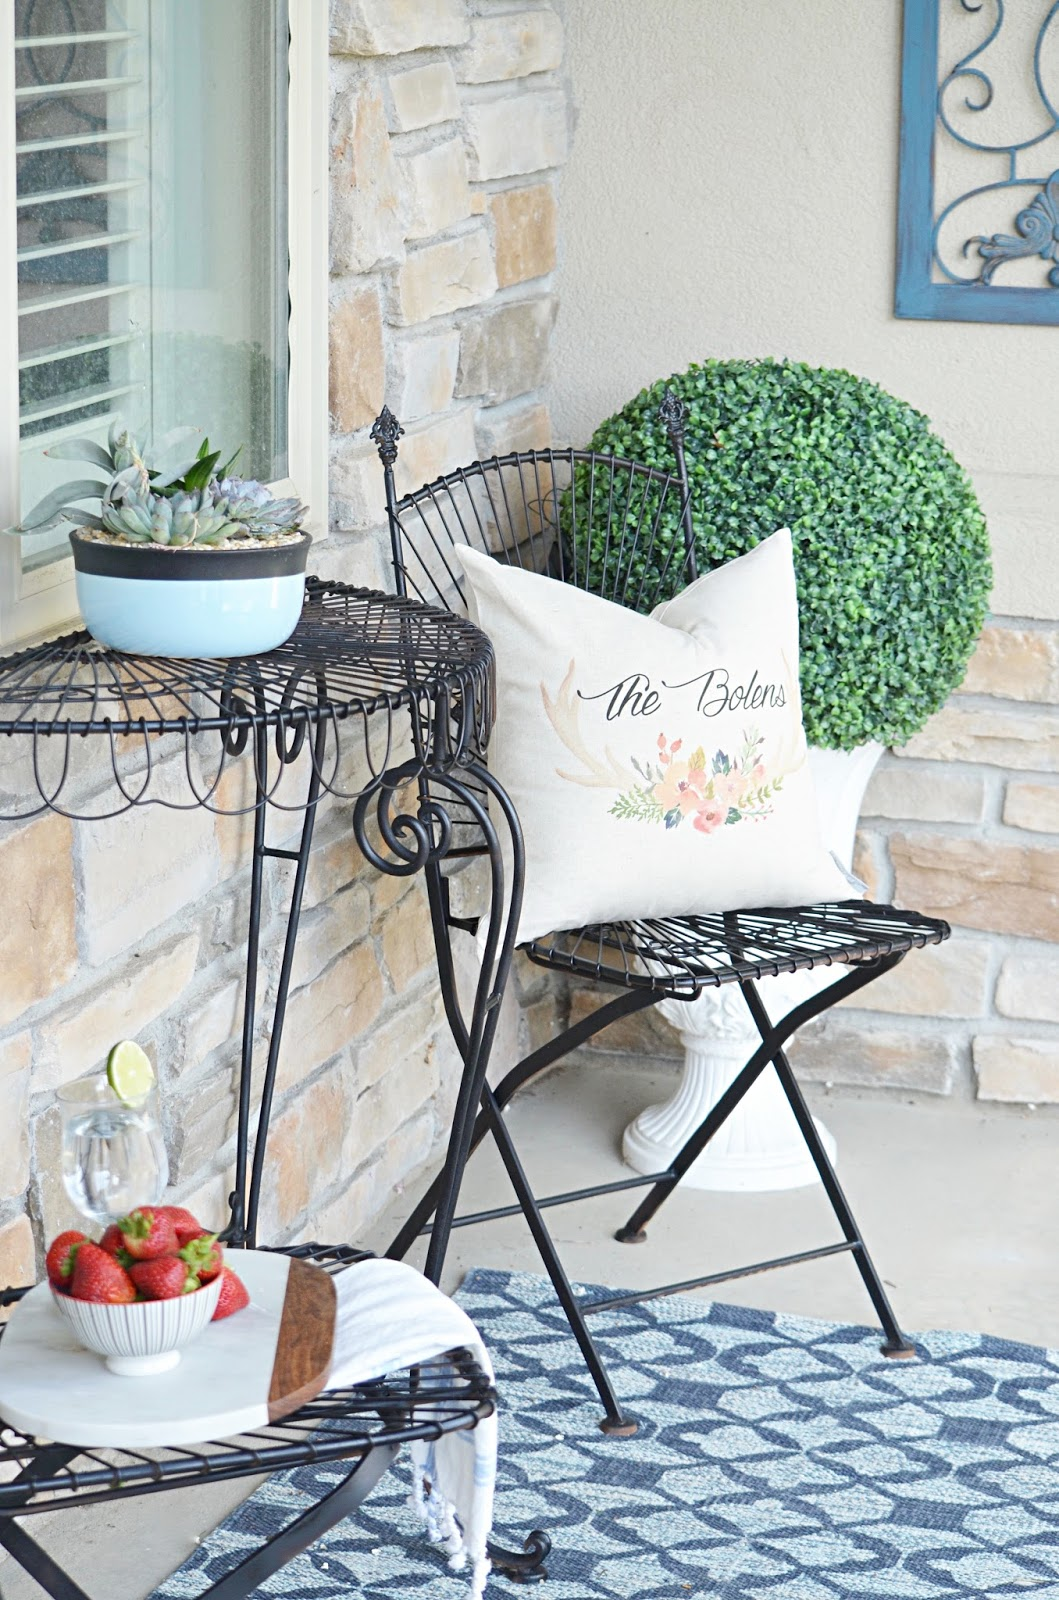 upcycle, patio, patio furniture, outdoor decor, outdoor pillow